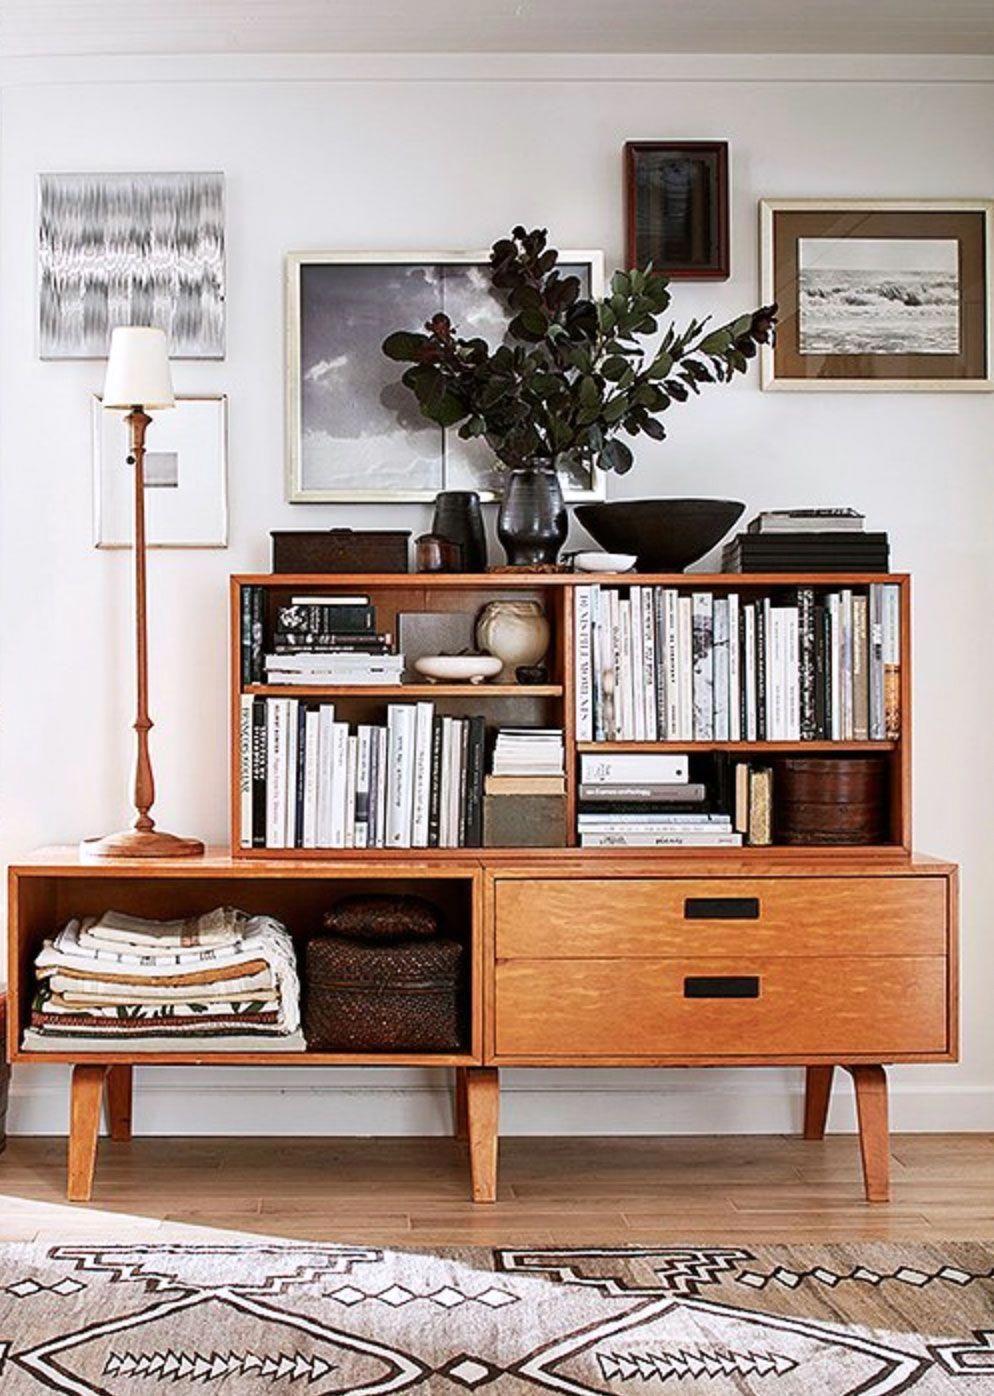 Cheap home decorating ideas commercialinteriordesign also best interior design images in rh pinterest